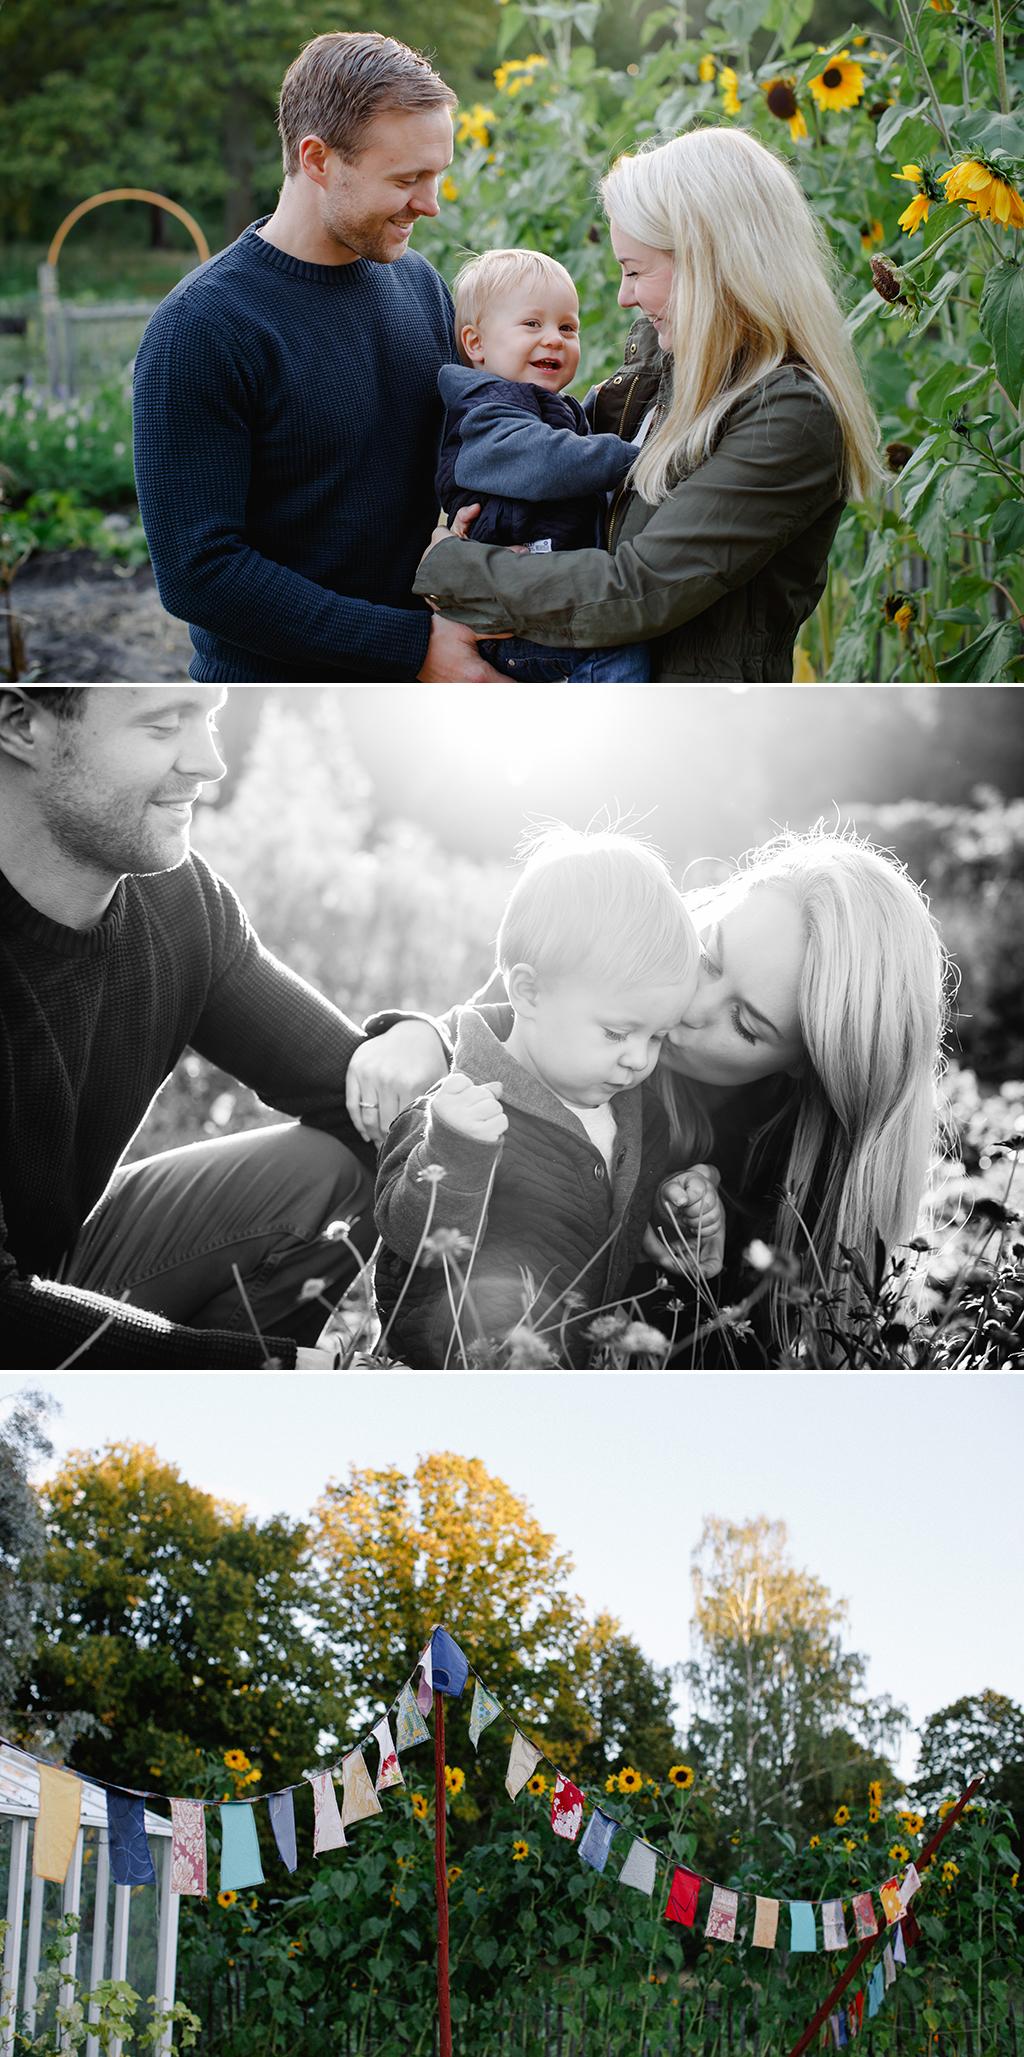 Familjefotografering_Stockholm_Familjefotograf_Familjebild_1.jpg